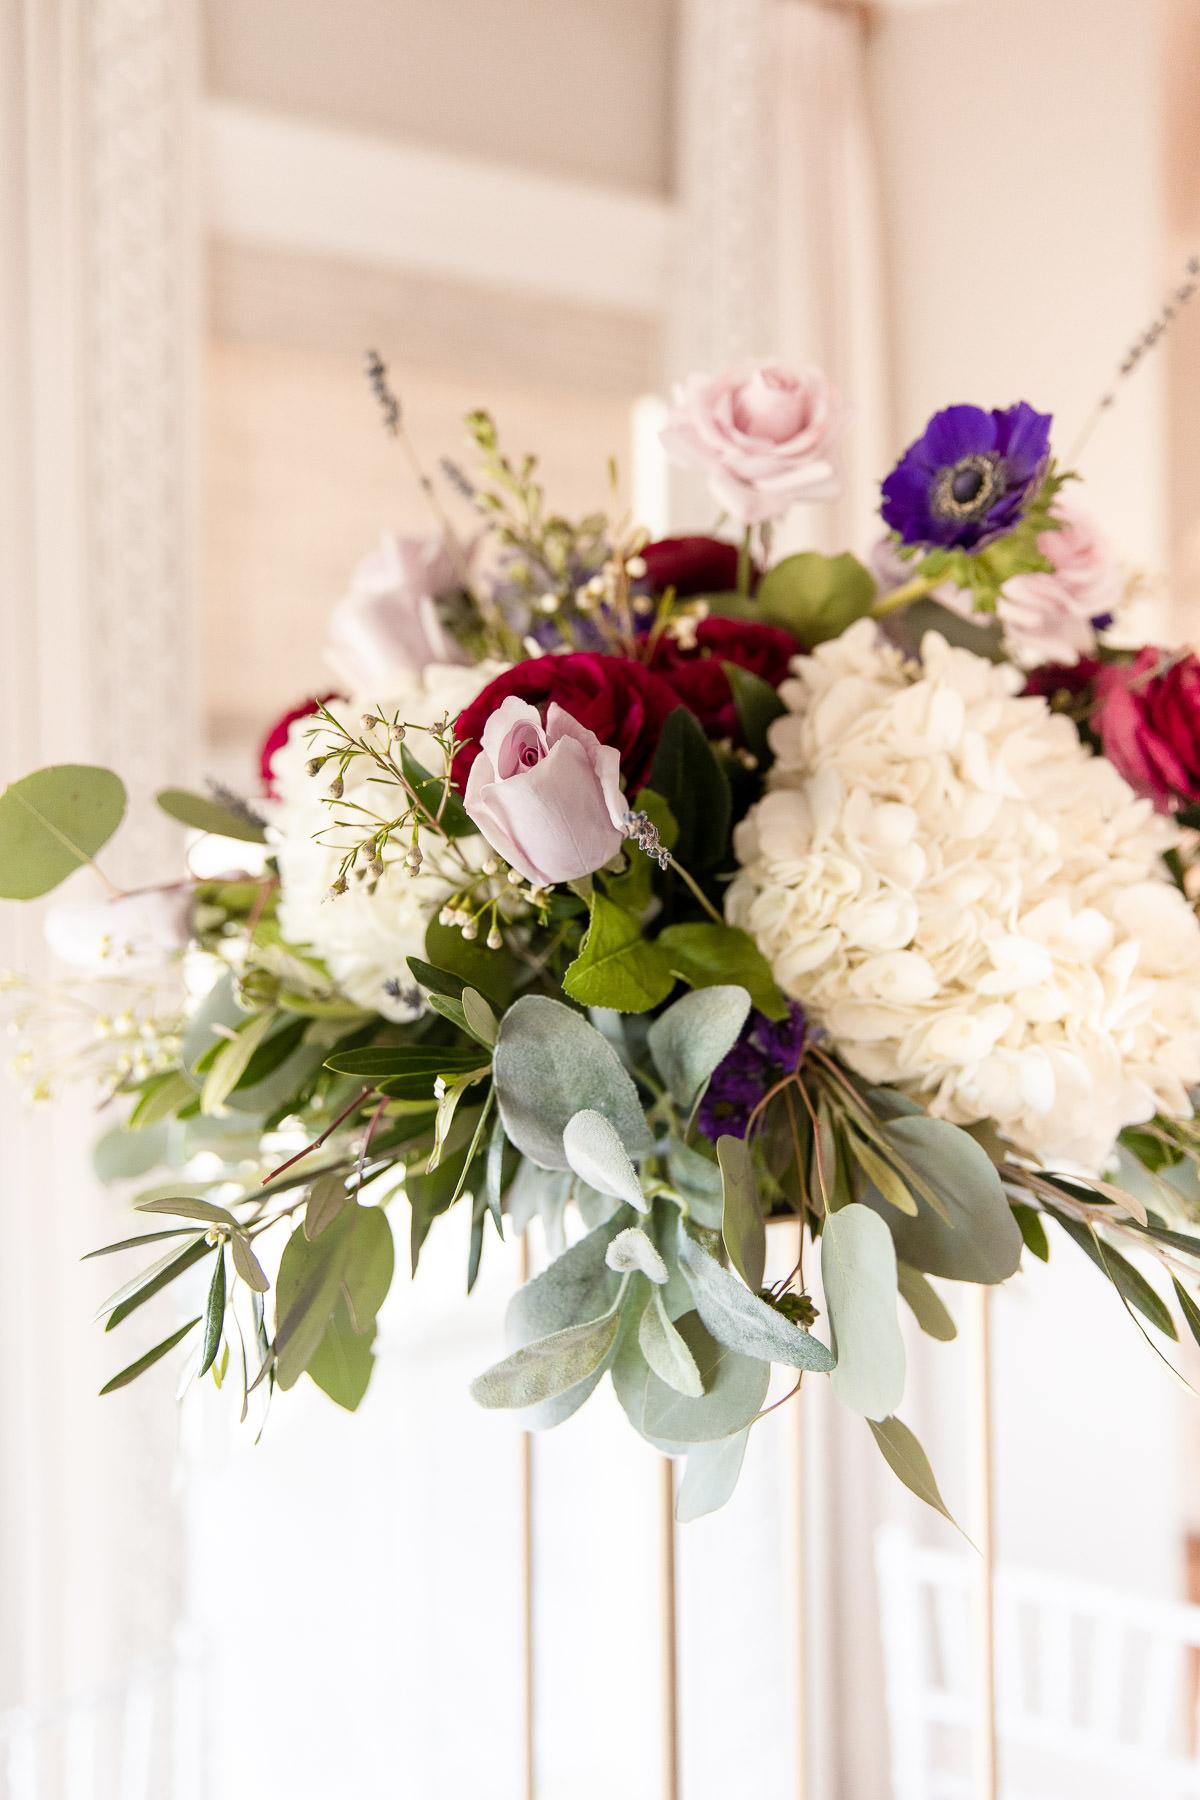 Eisenhower House, Newport, Rhode Island, Tracy Jenkins Photography, wedding, LGBTQ+, LGBT, Gay, Inclusive, Photography, Wedding photography, flowers, centerpiece